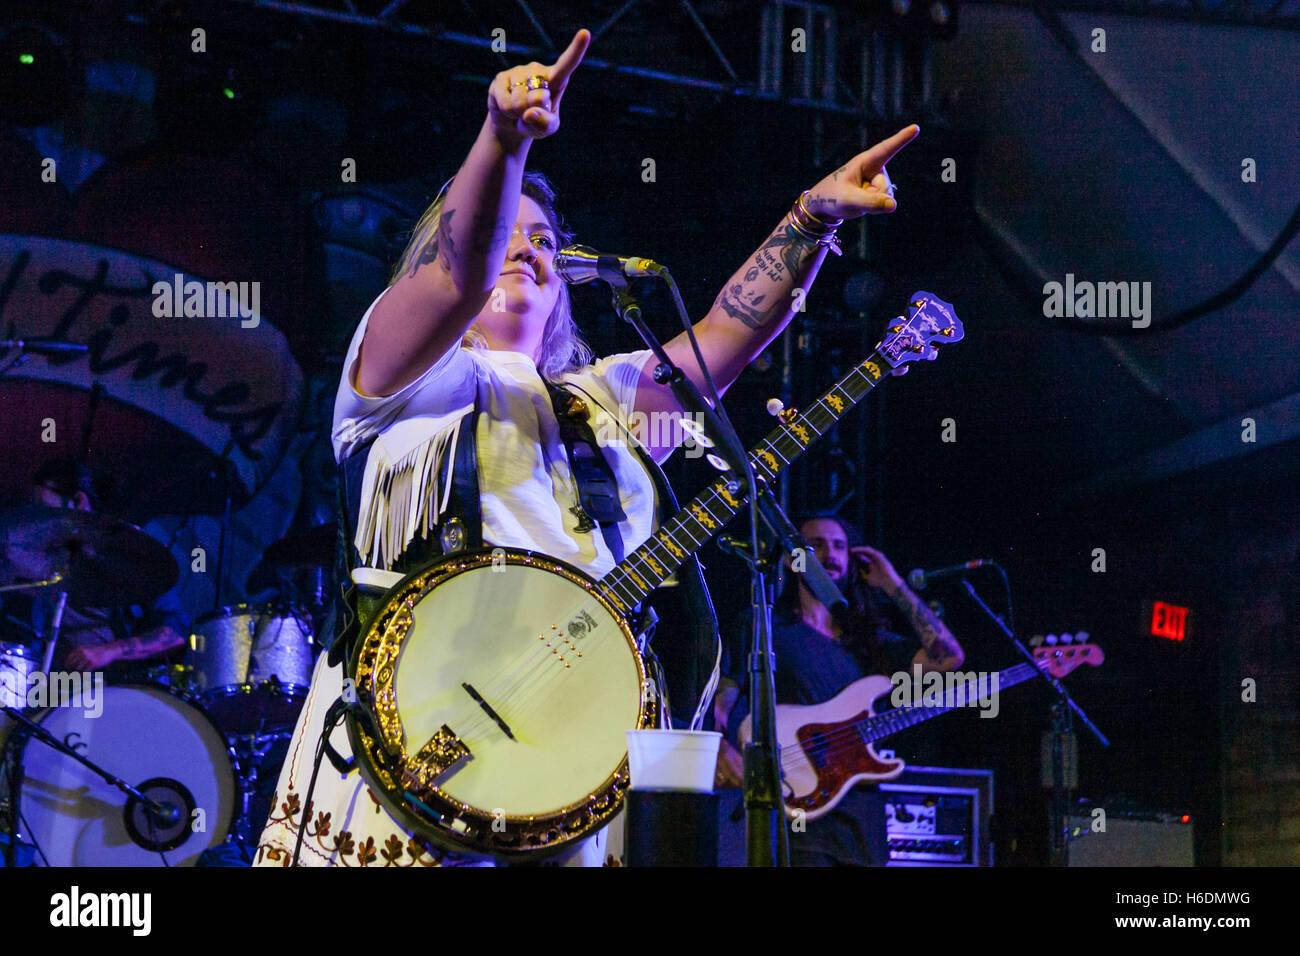 Austin, Texas, USA. 25. Oktober 2016. Elle King Konzert in Austin, TX. © Rustin Gudim/ZUMA Draht/Alamy Live-Nachrichten Stockfoto